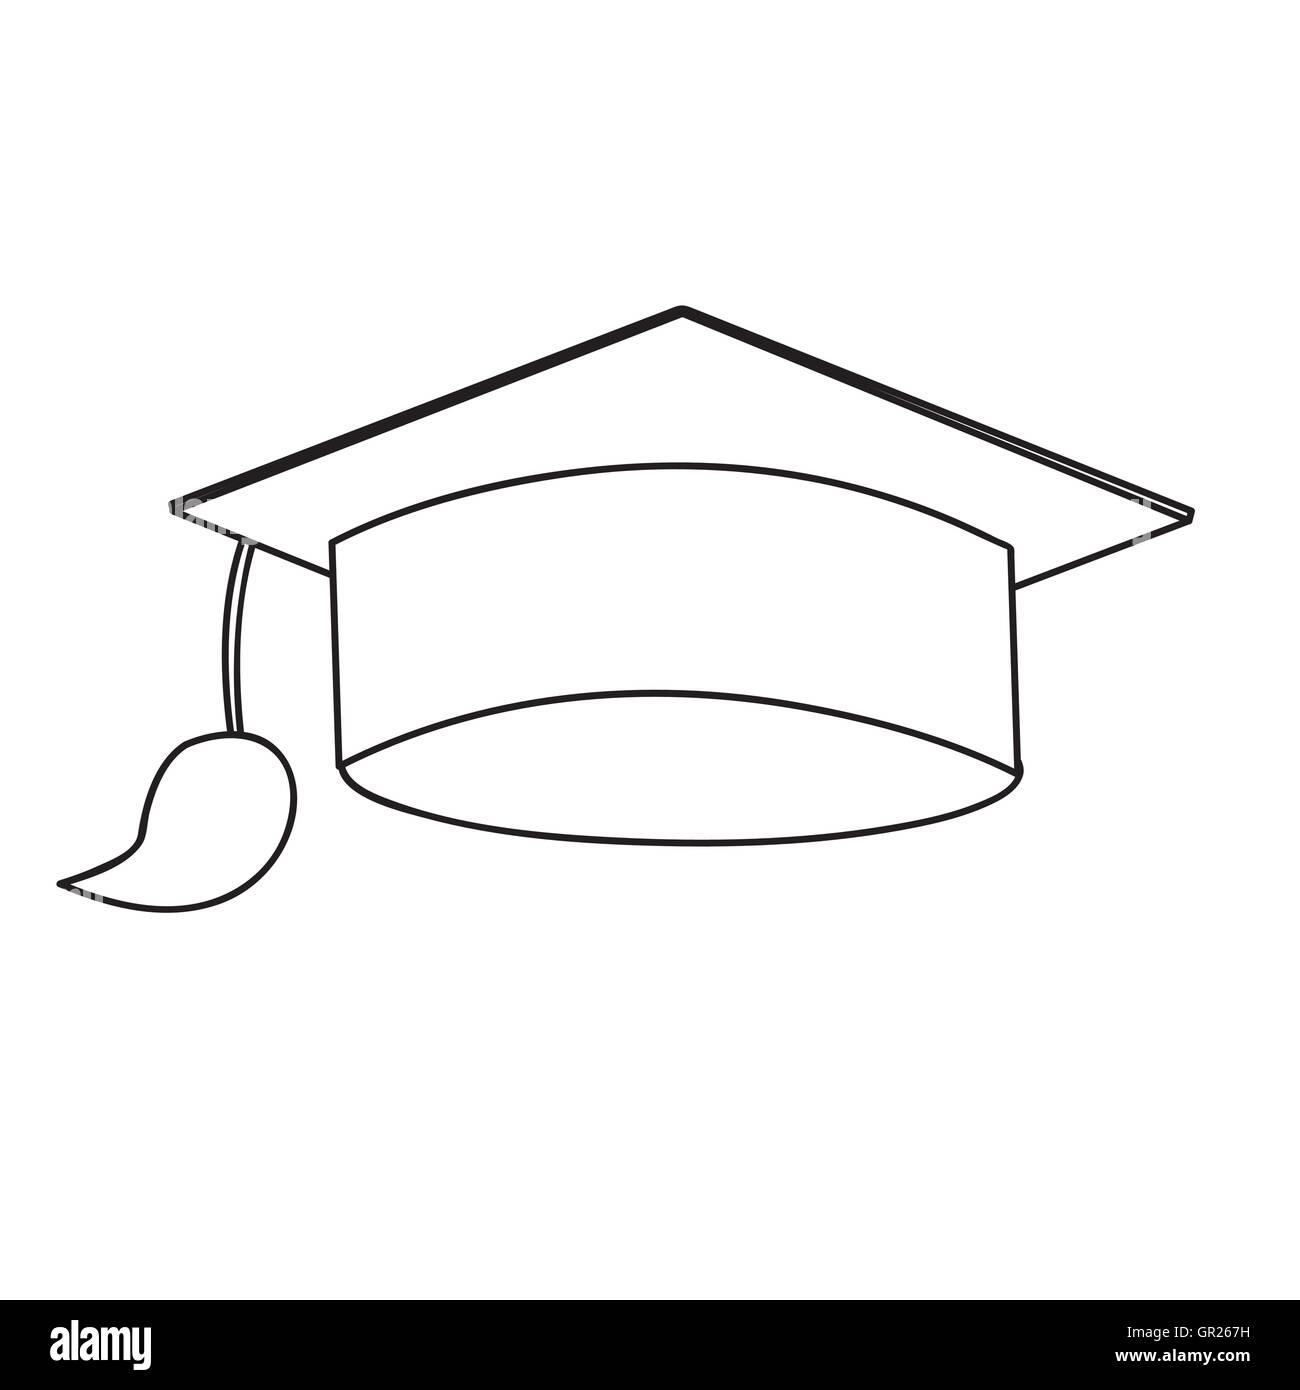 School elements - Stock Image